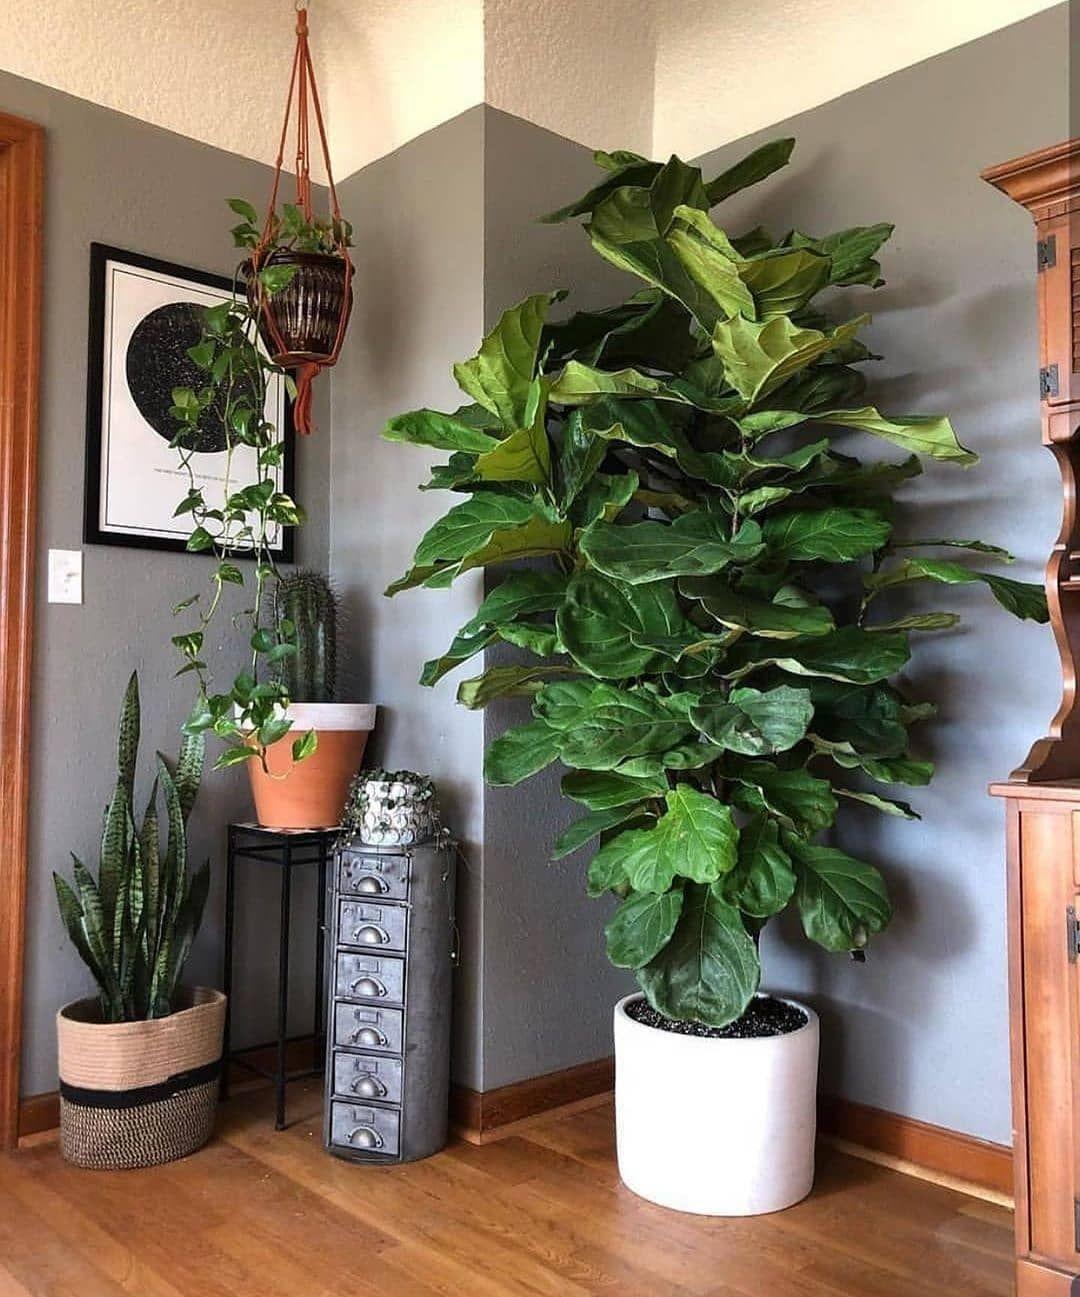 Boho Style Interior Decor Design | Diy plant stand, Fiddle ... on Amazing Plant Stand Ideas  id=88105